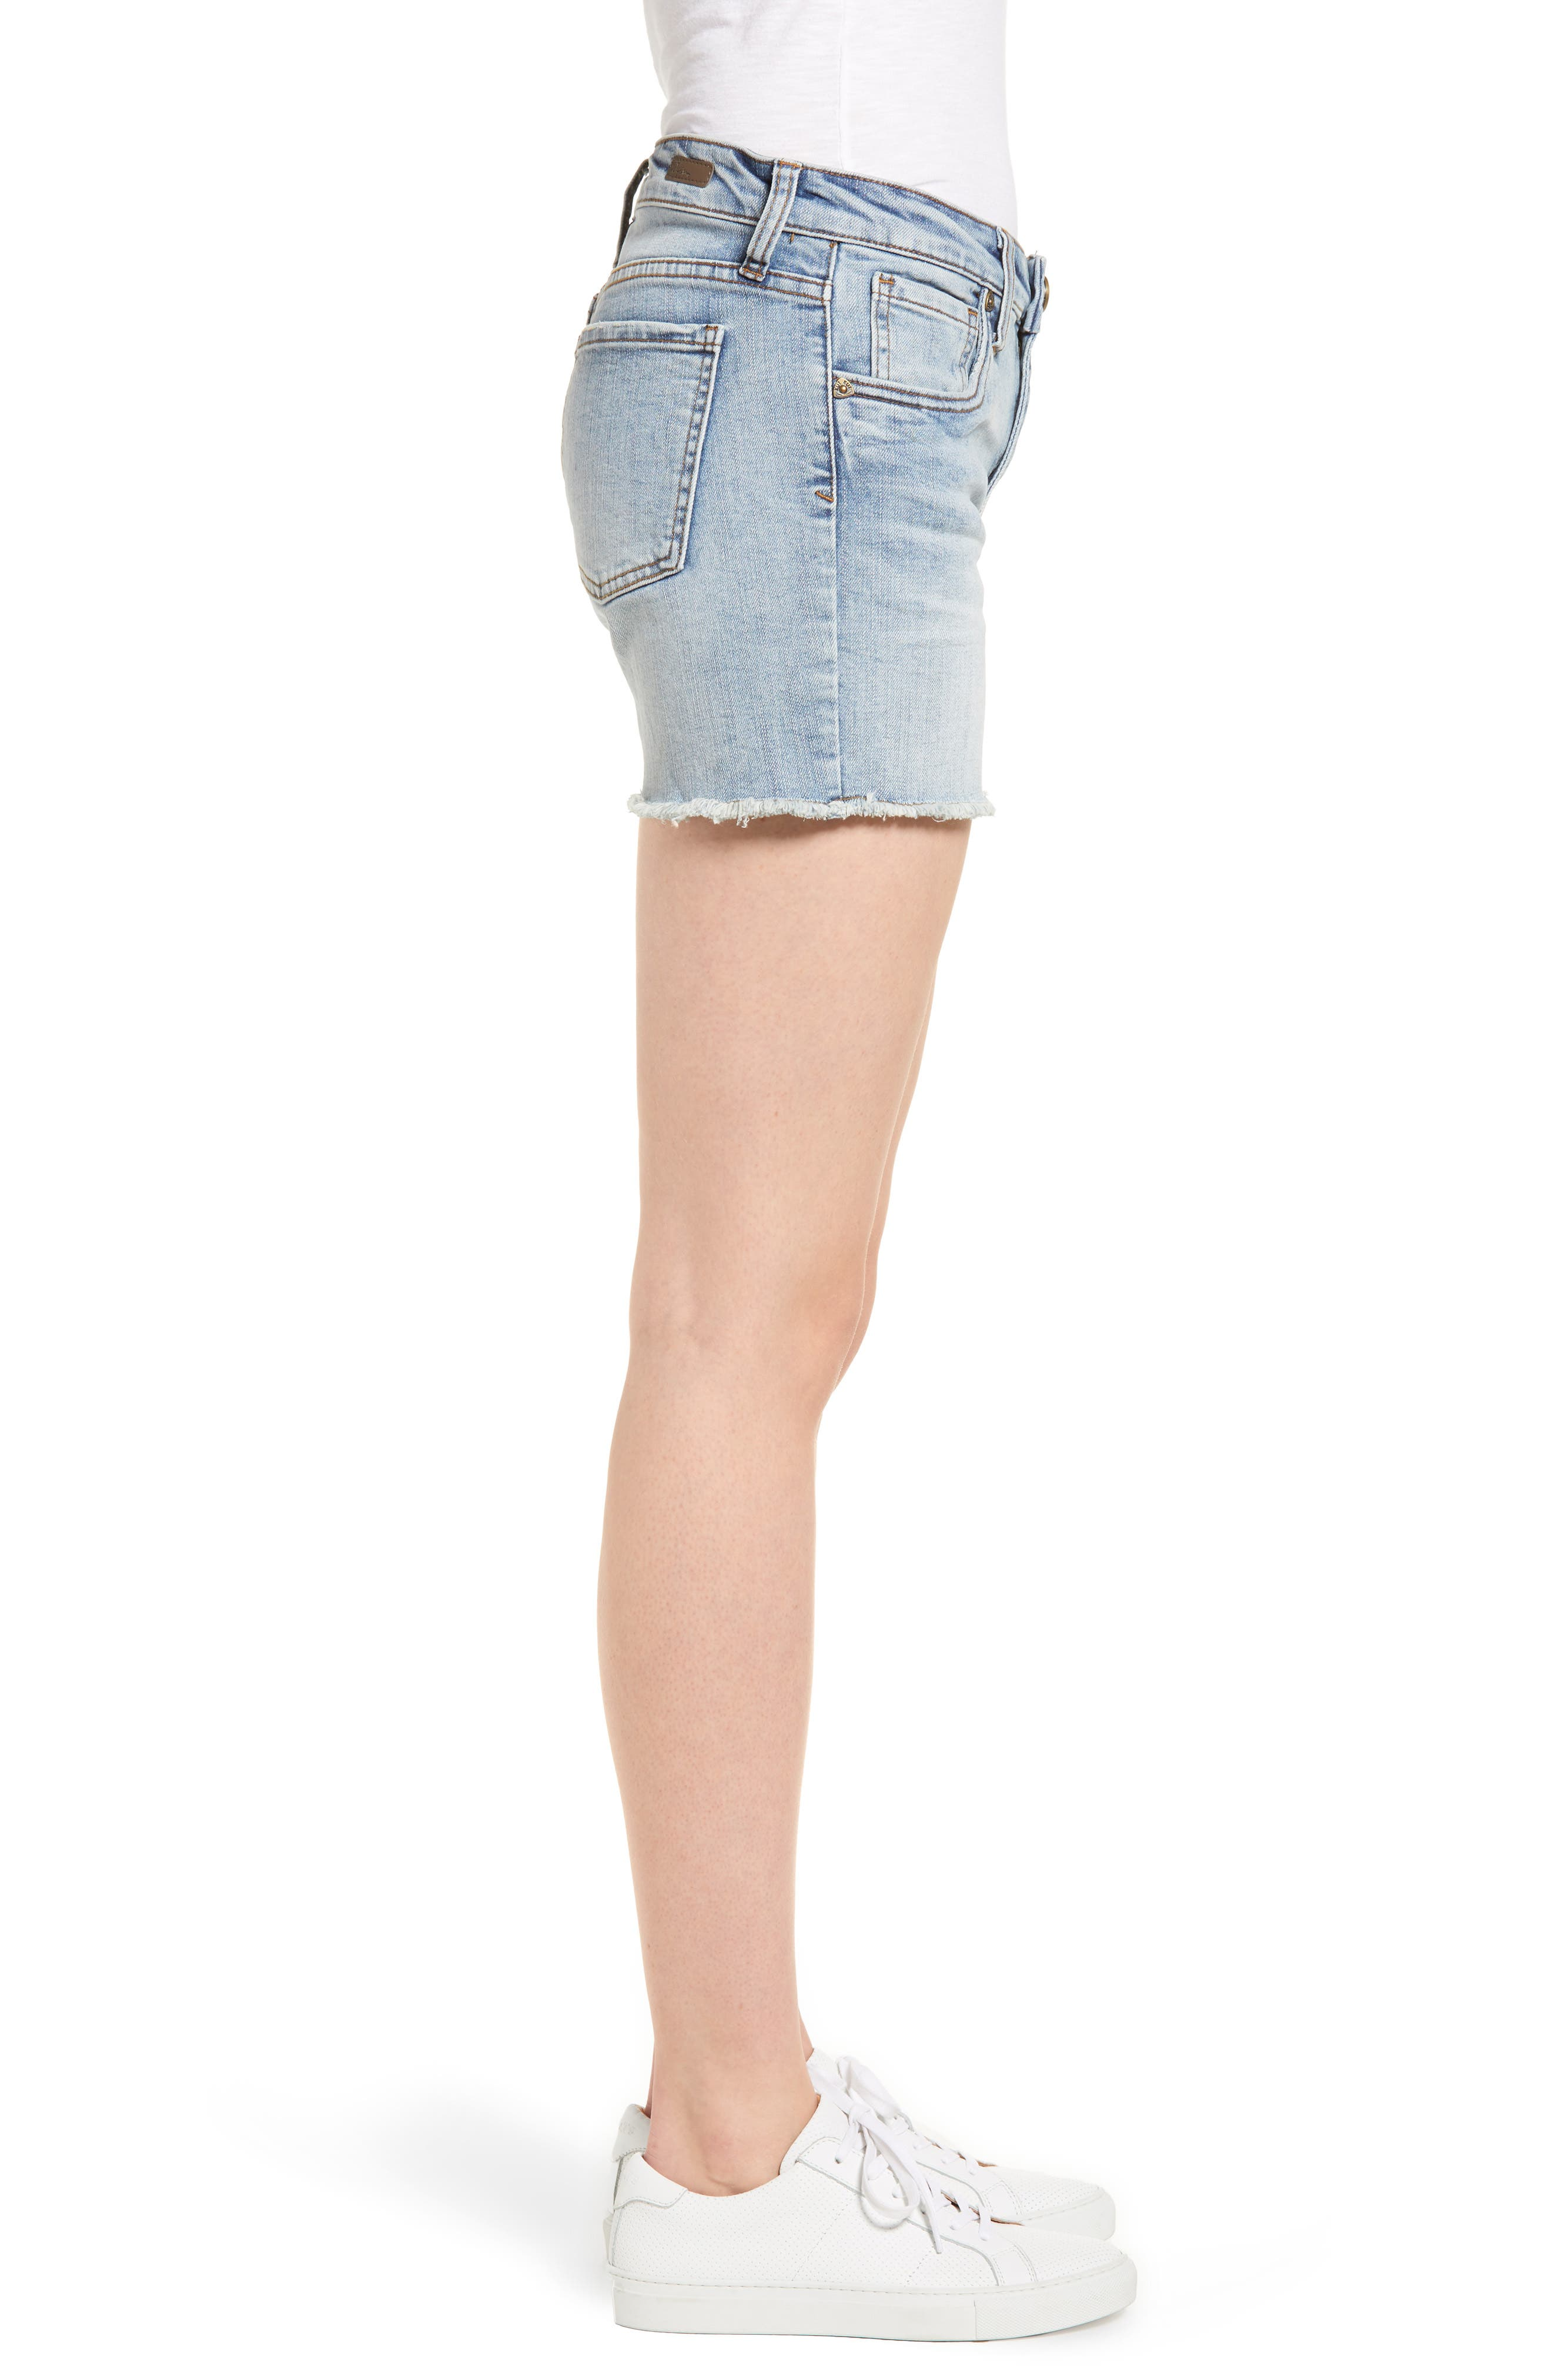 Gidget Cutoff Denim Shorts,                             Alternate thumbnail 3, color,                             470